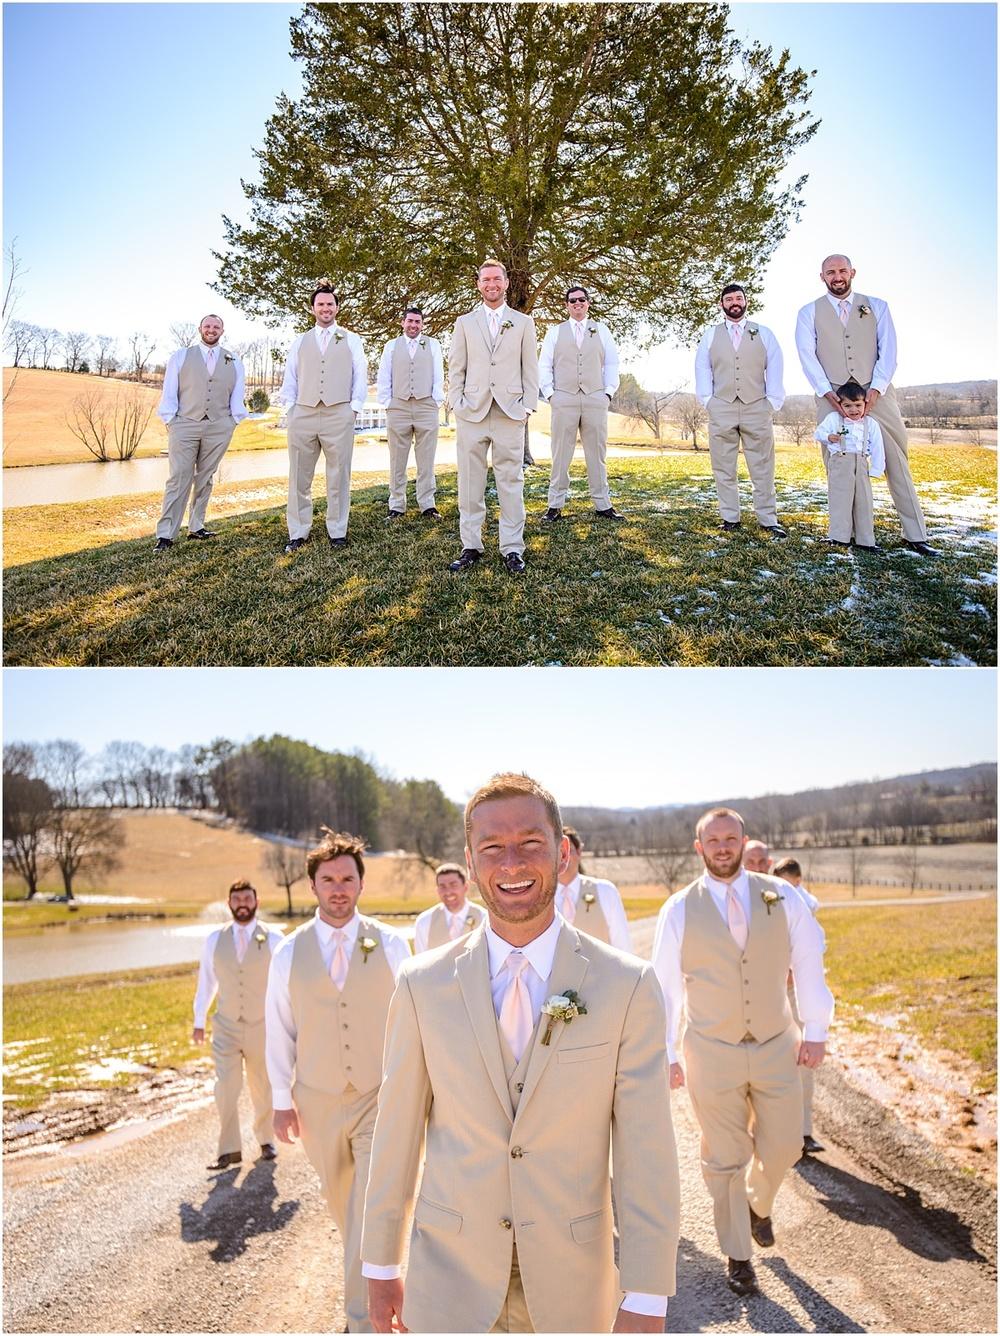 Greg Smit Photography Nashville wedding photographer Mint Springs Farm_0247